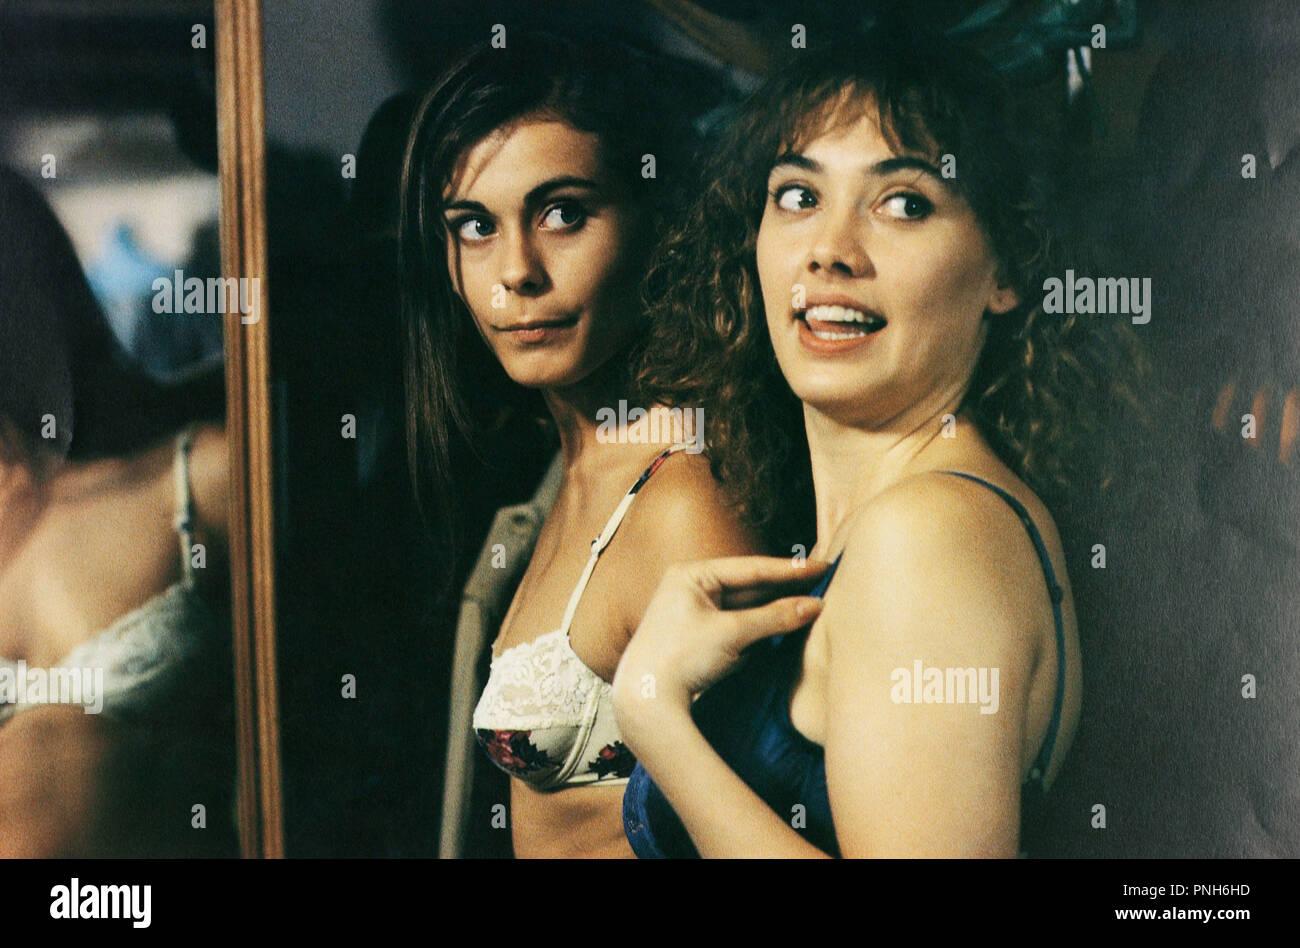 Original film title: NO ET TALLIS NI UN PEL. English title: NO ET TALLIS NI UN PEL. Year: 1992. Director: FRANCESC CASANOVA. - Stock Image